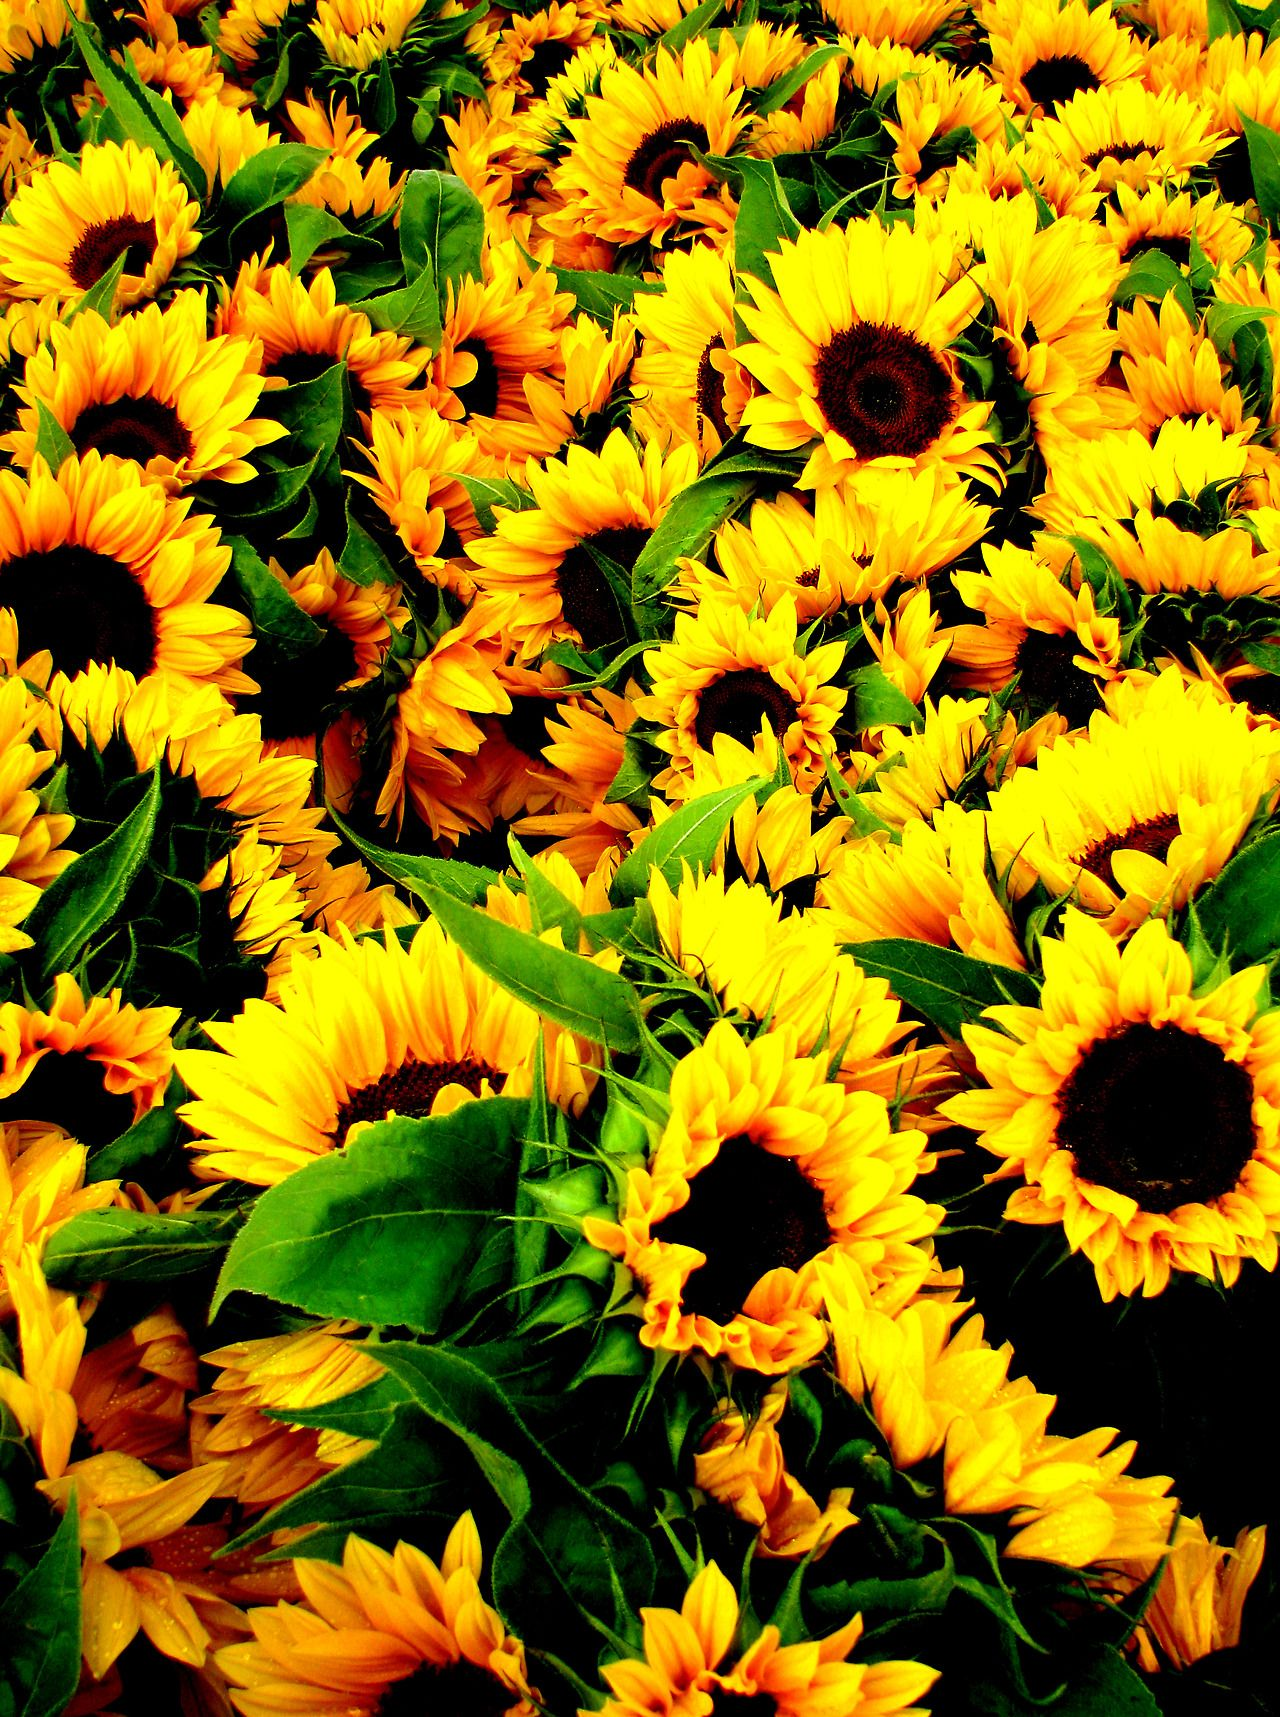 Sunflowers 🌻 🌻🌻 Sunflower wallpaper, Nature photography